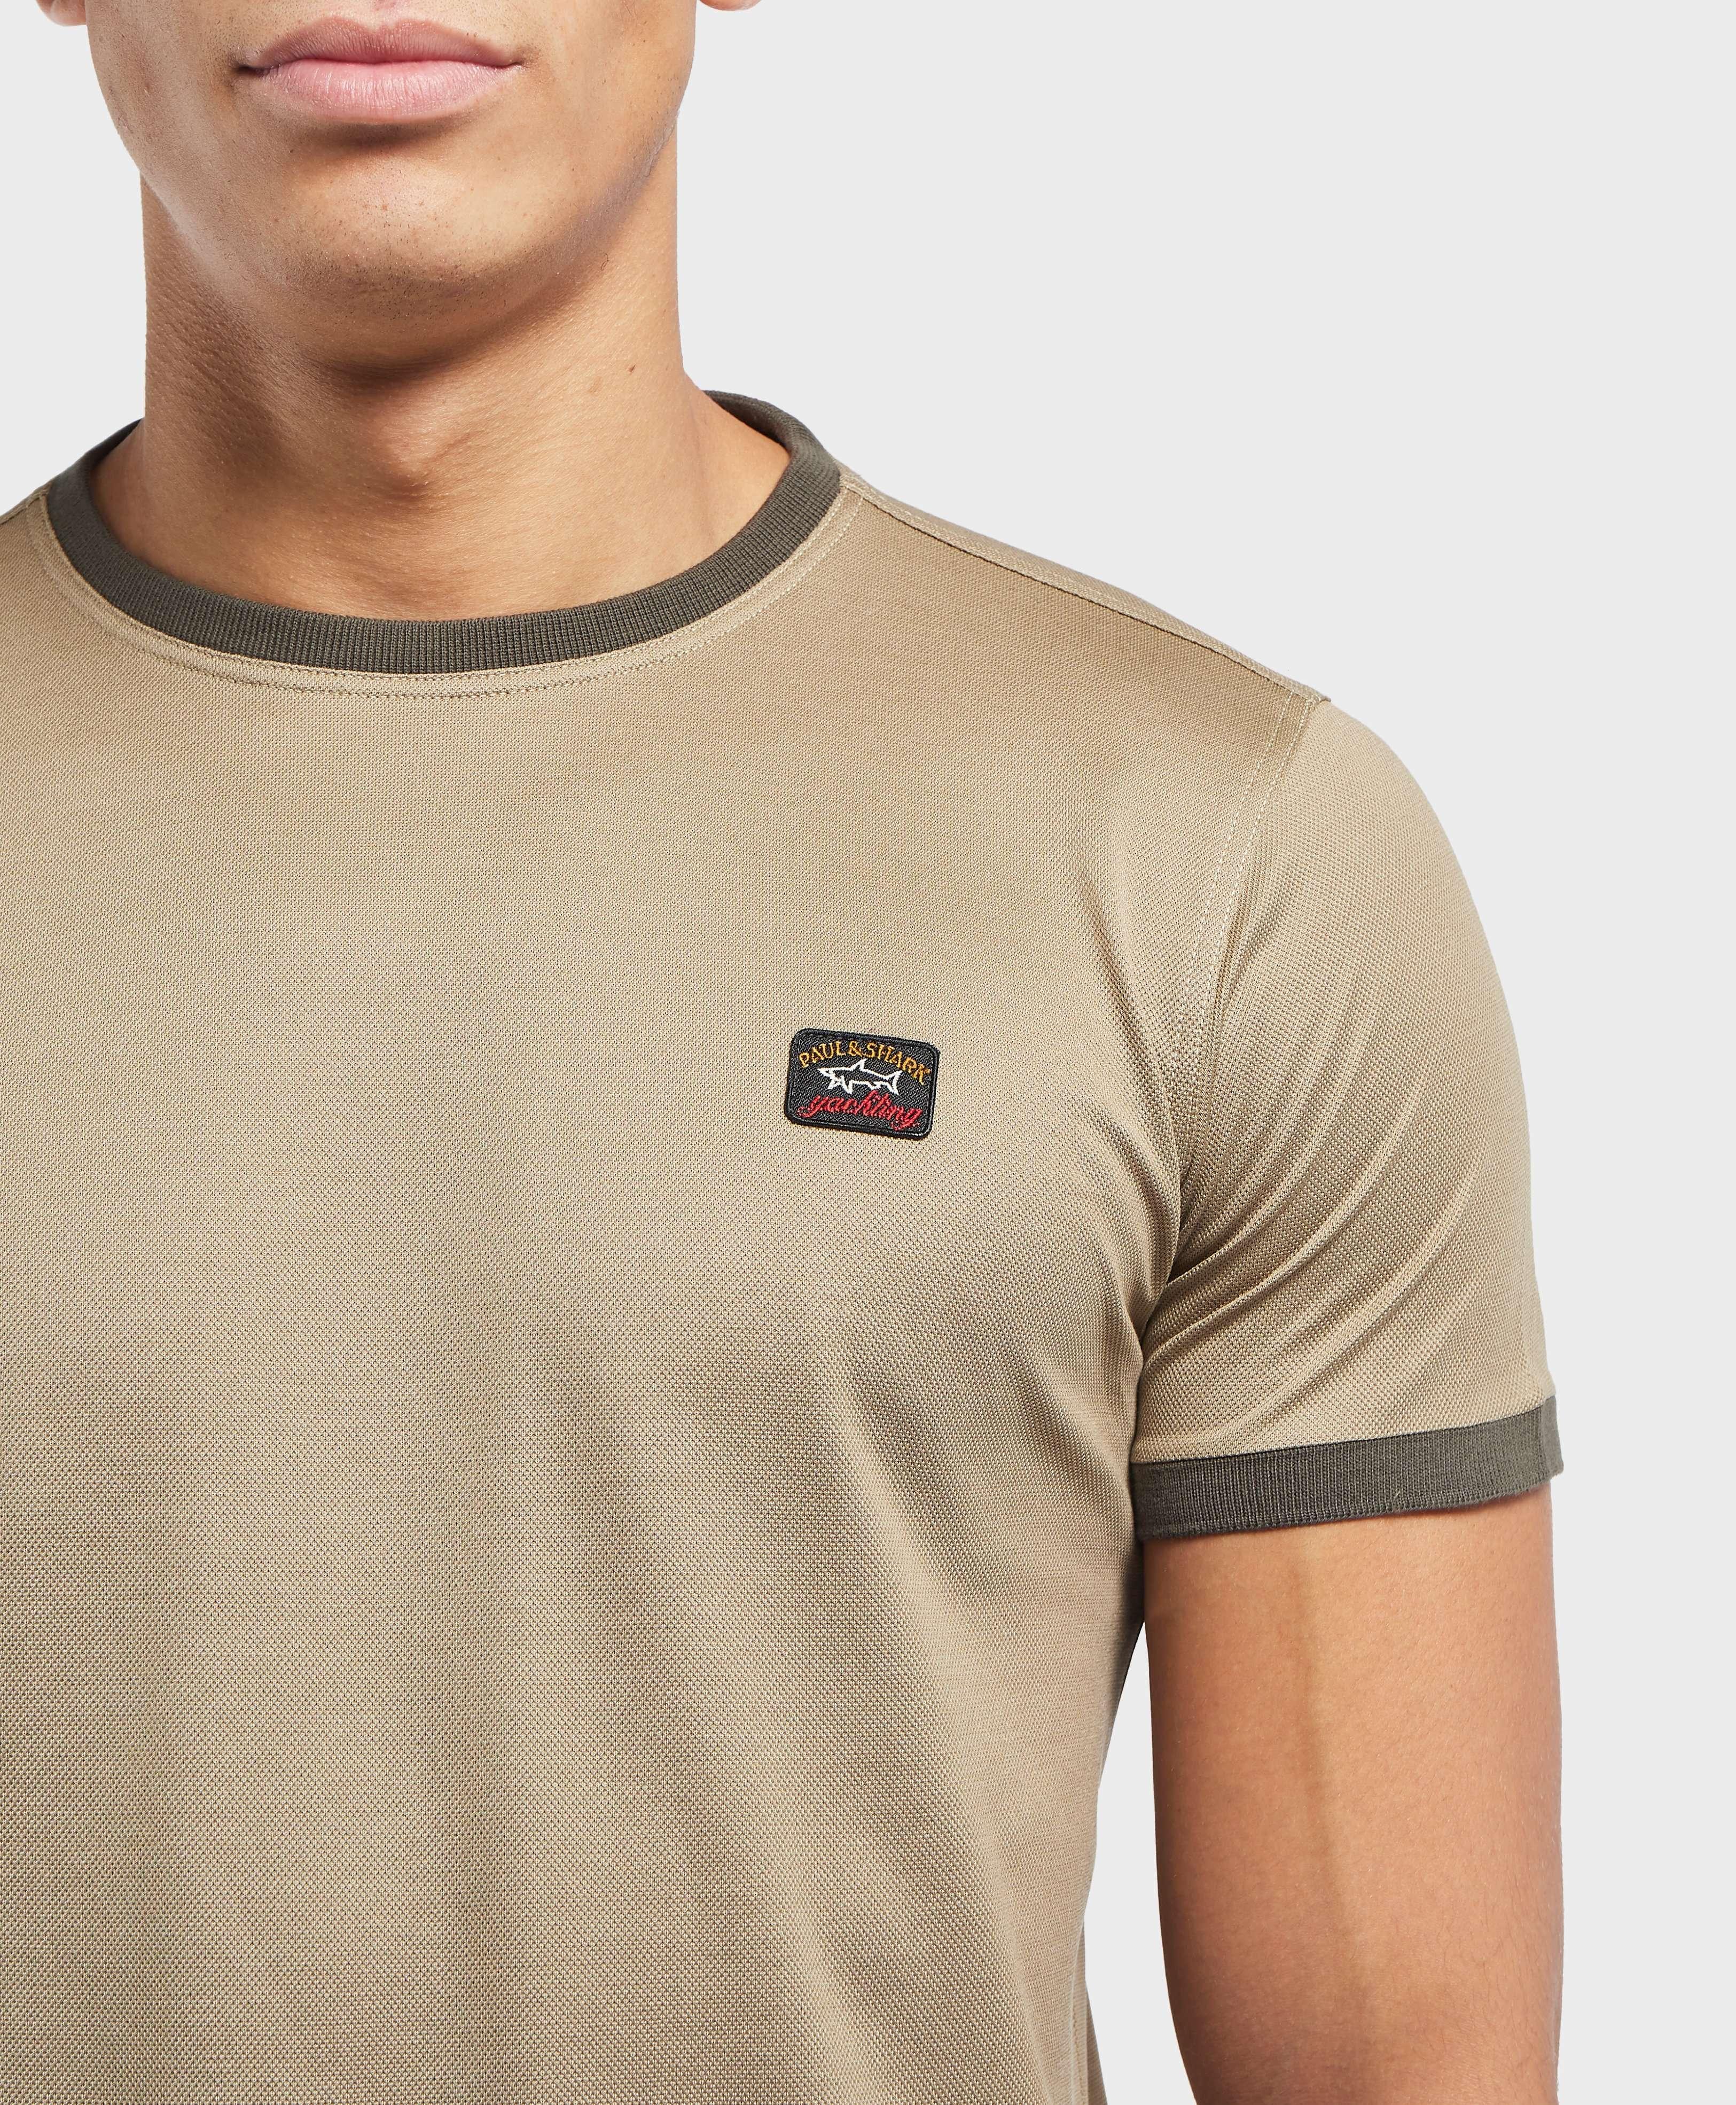 Paul and Shark Pique Ringer Short Sleeve T-Shirt